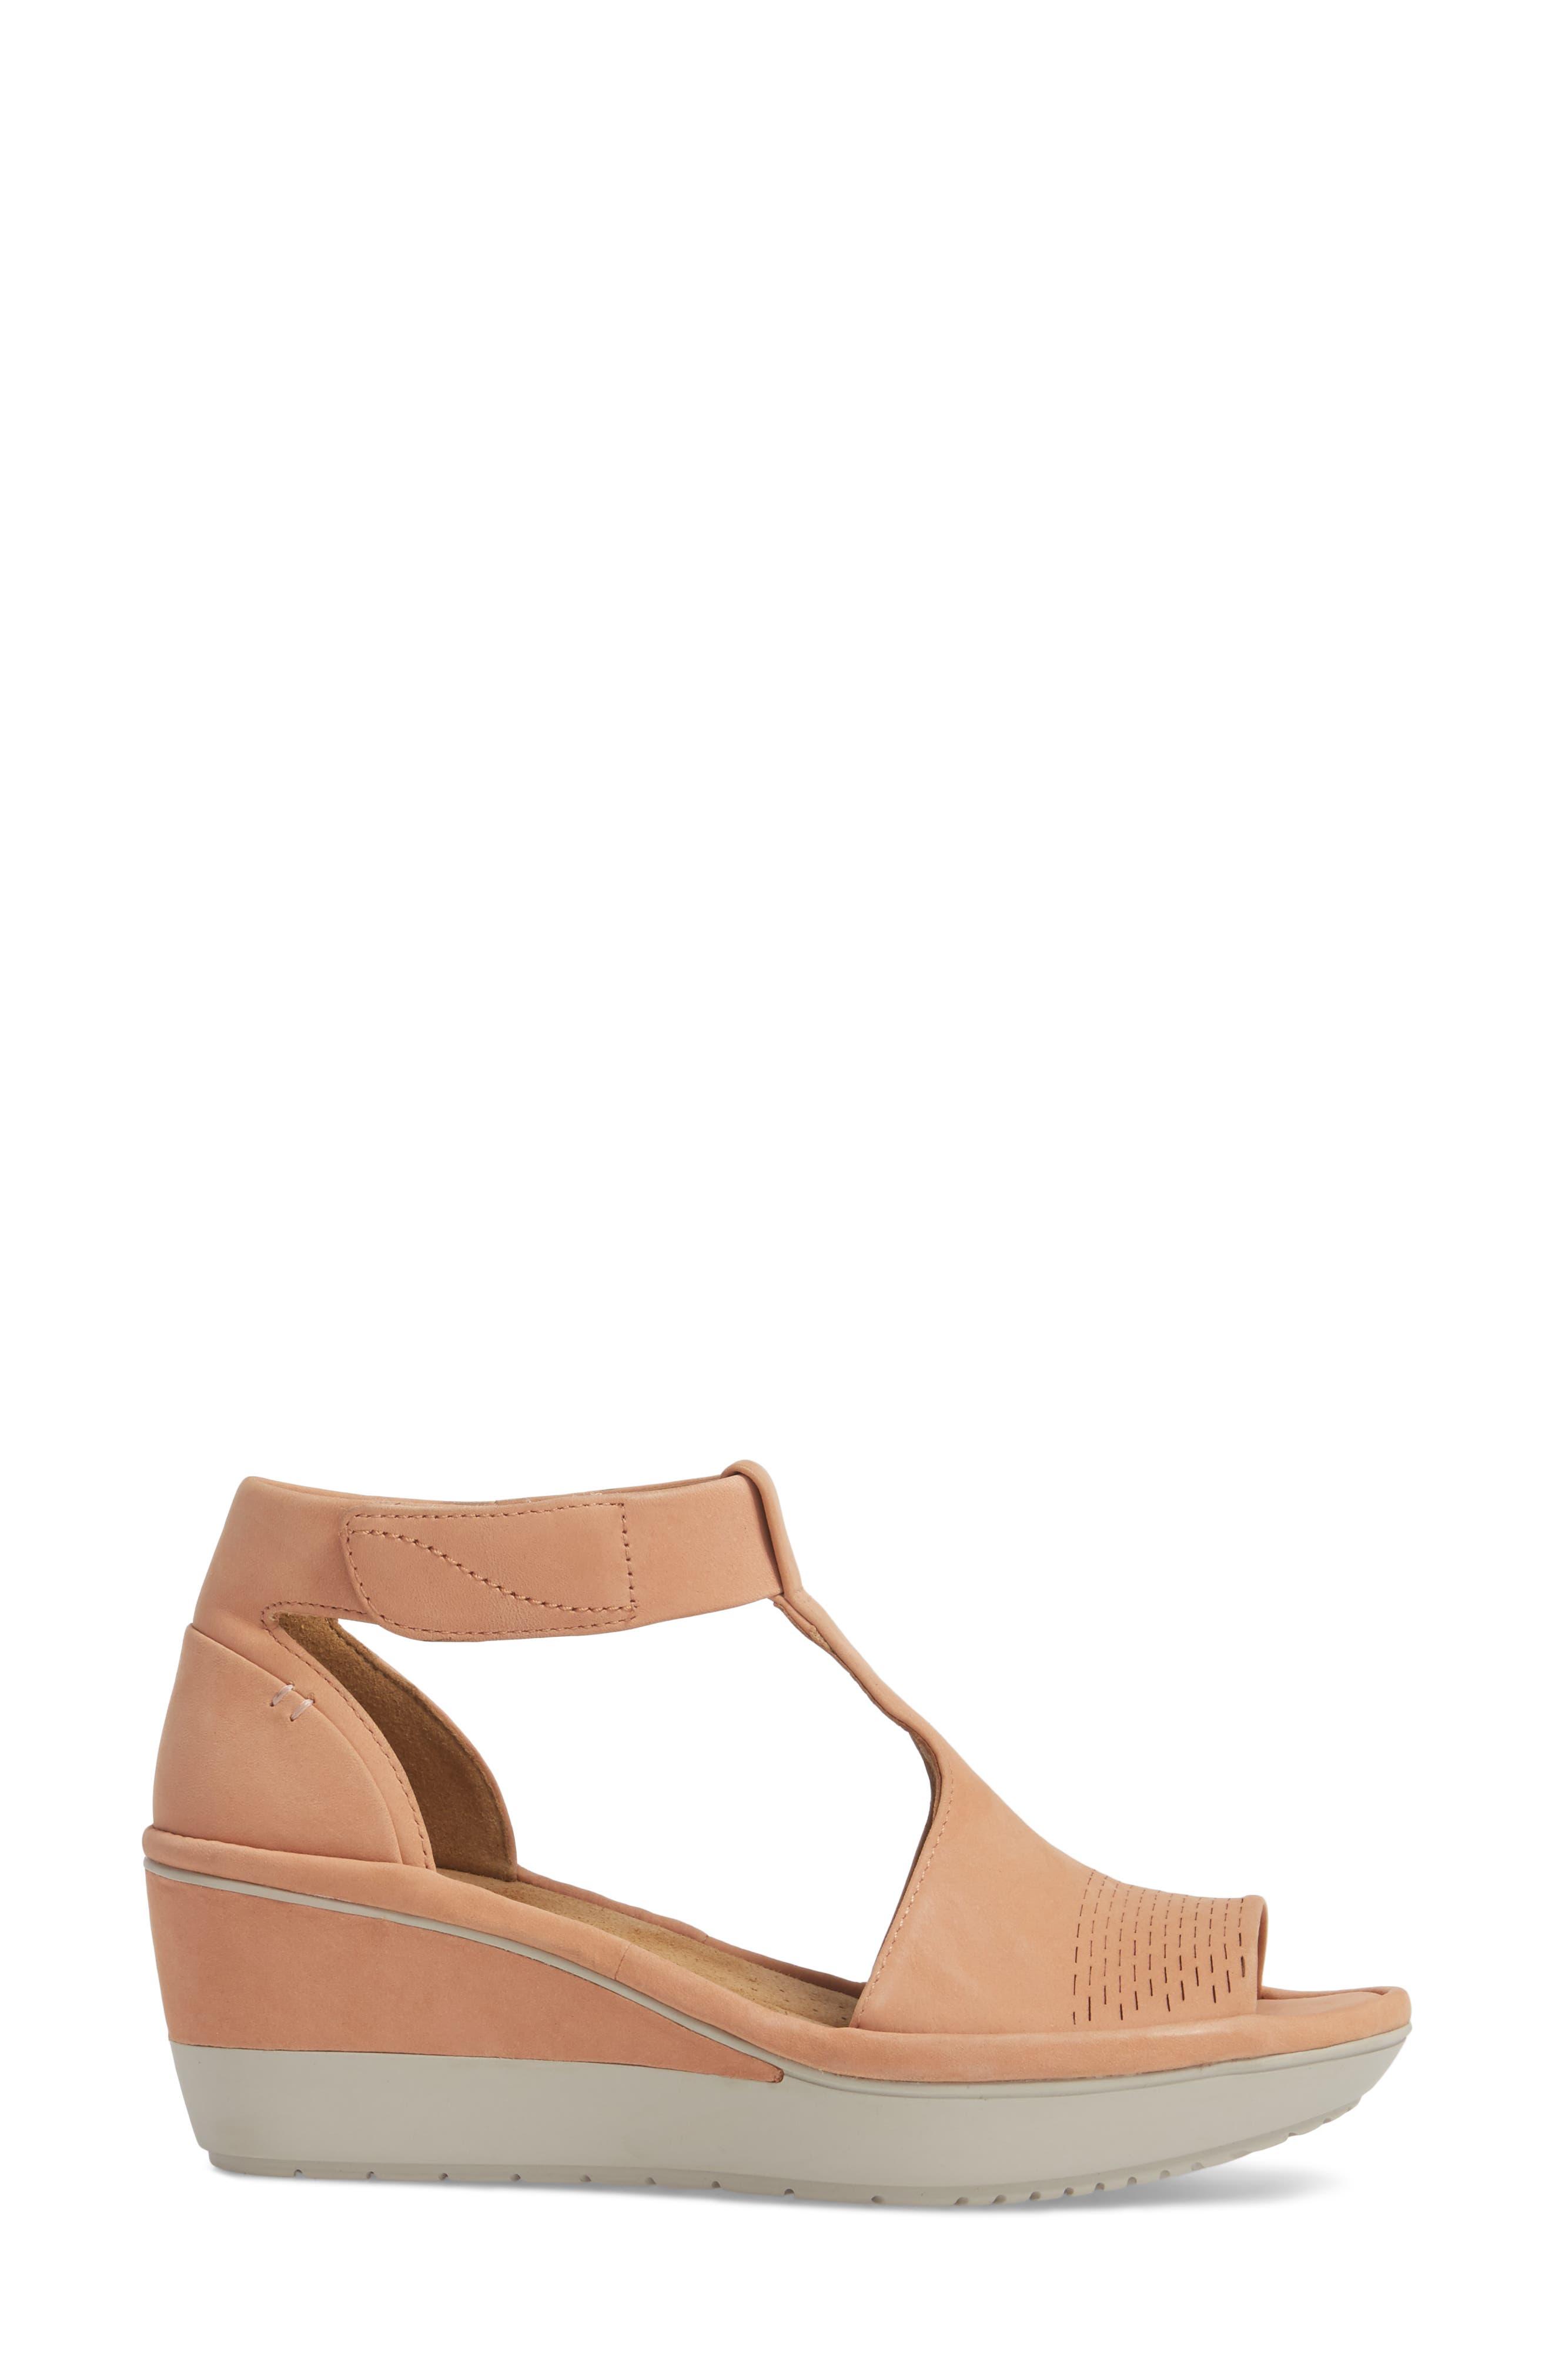 Wynnmere Avah T-Strap Wedge Sandal,                             Alternate thumbnail 3, color,                             Peach Nubuck